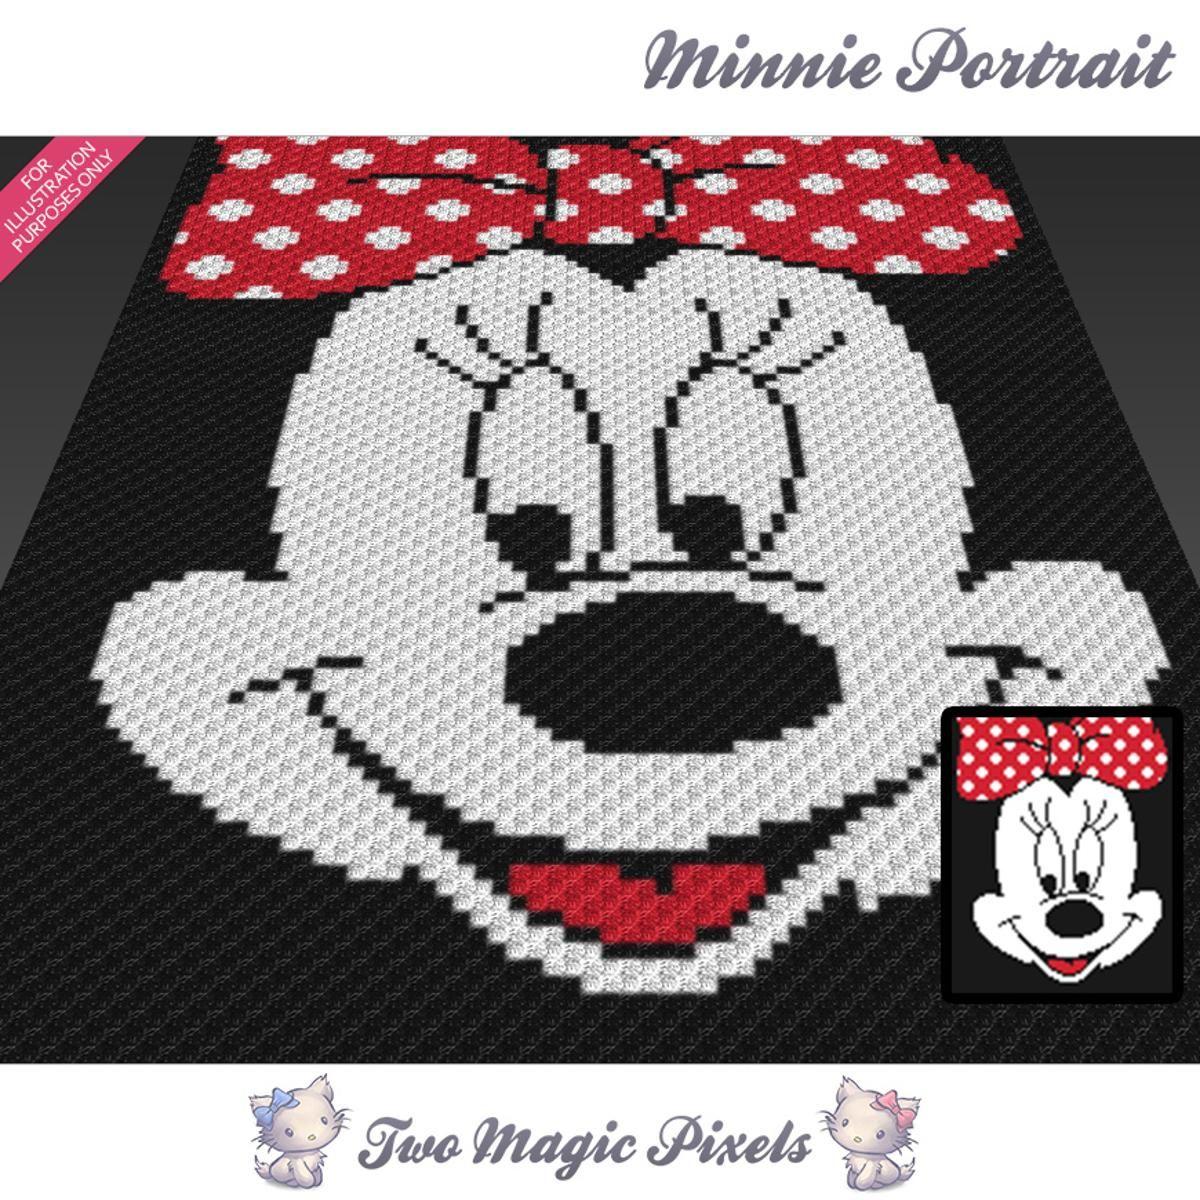 Minnie Portrait C2C Crochet Graph | Colchas, Manta y Puntos